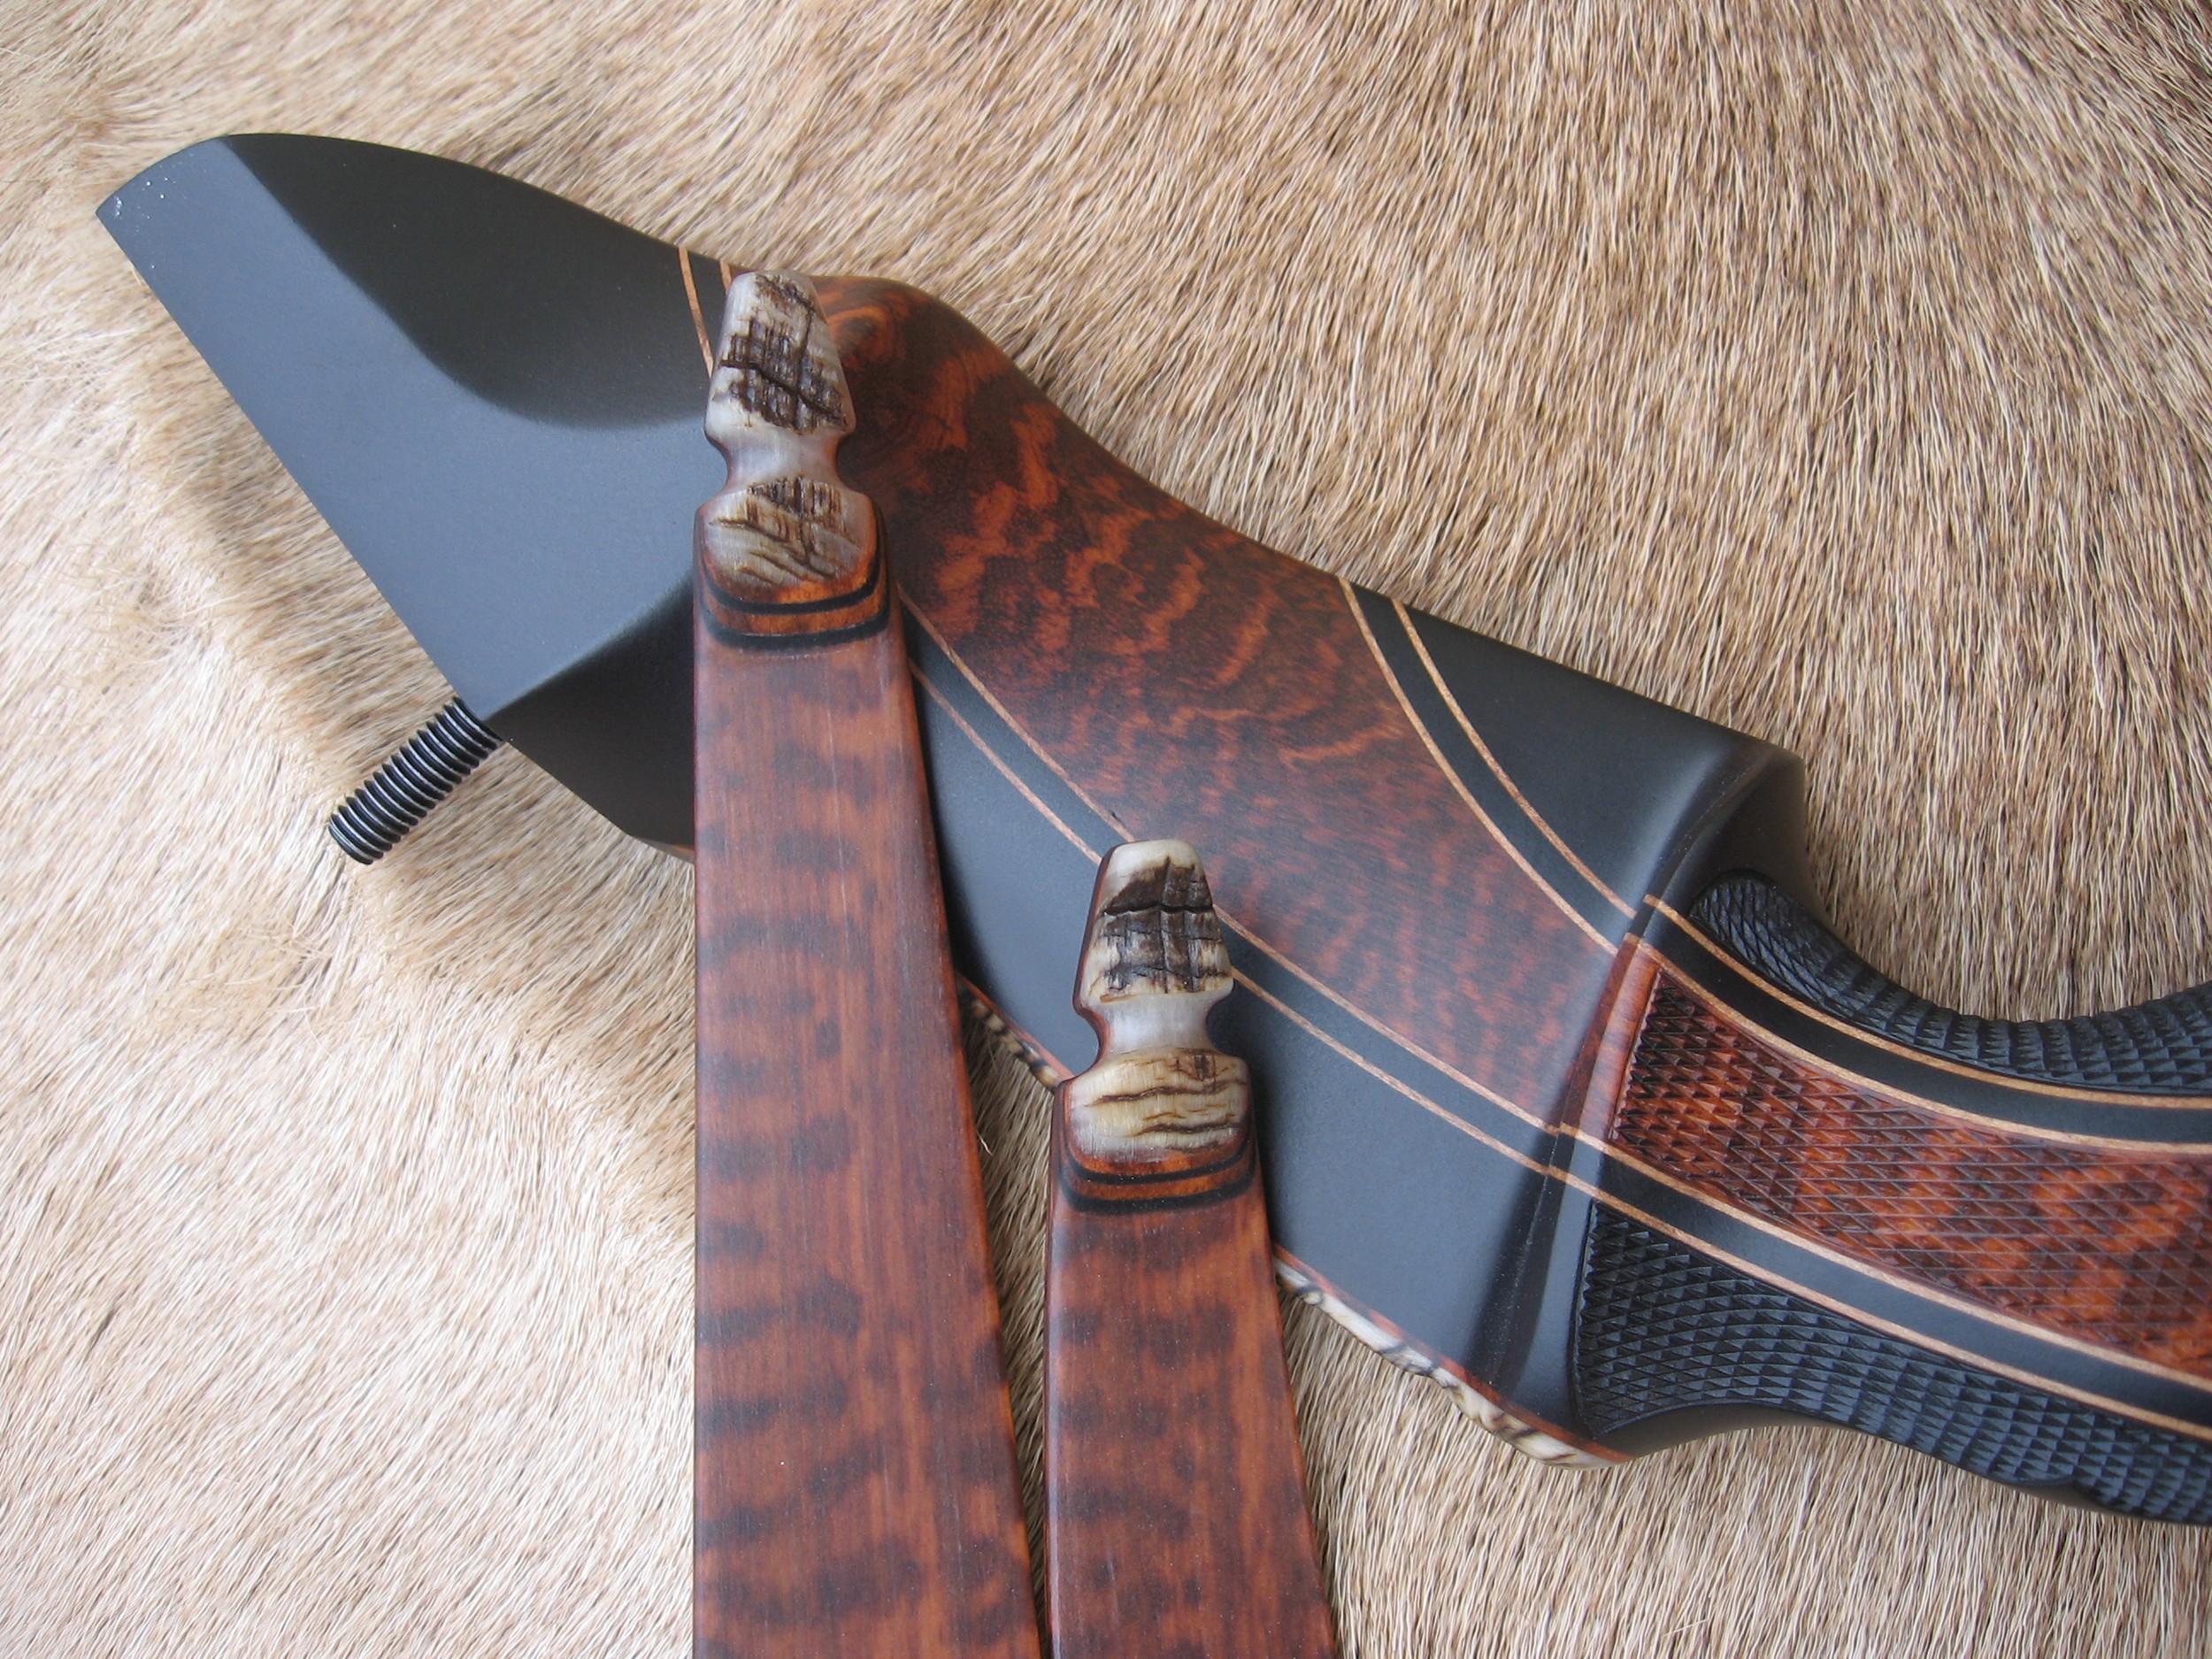 Gaboon Ebony Riser w/ Snakewood Cresent- Snakewood Limbs w/ Rough Sheep Horn tips